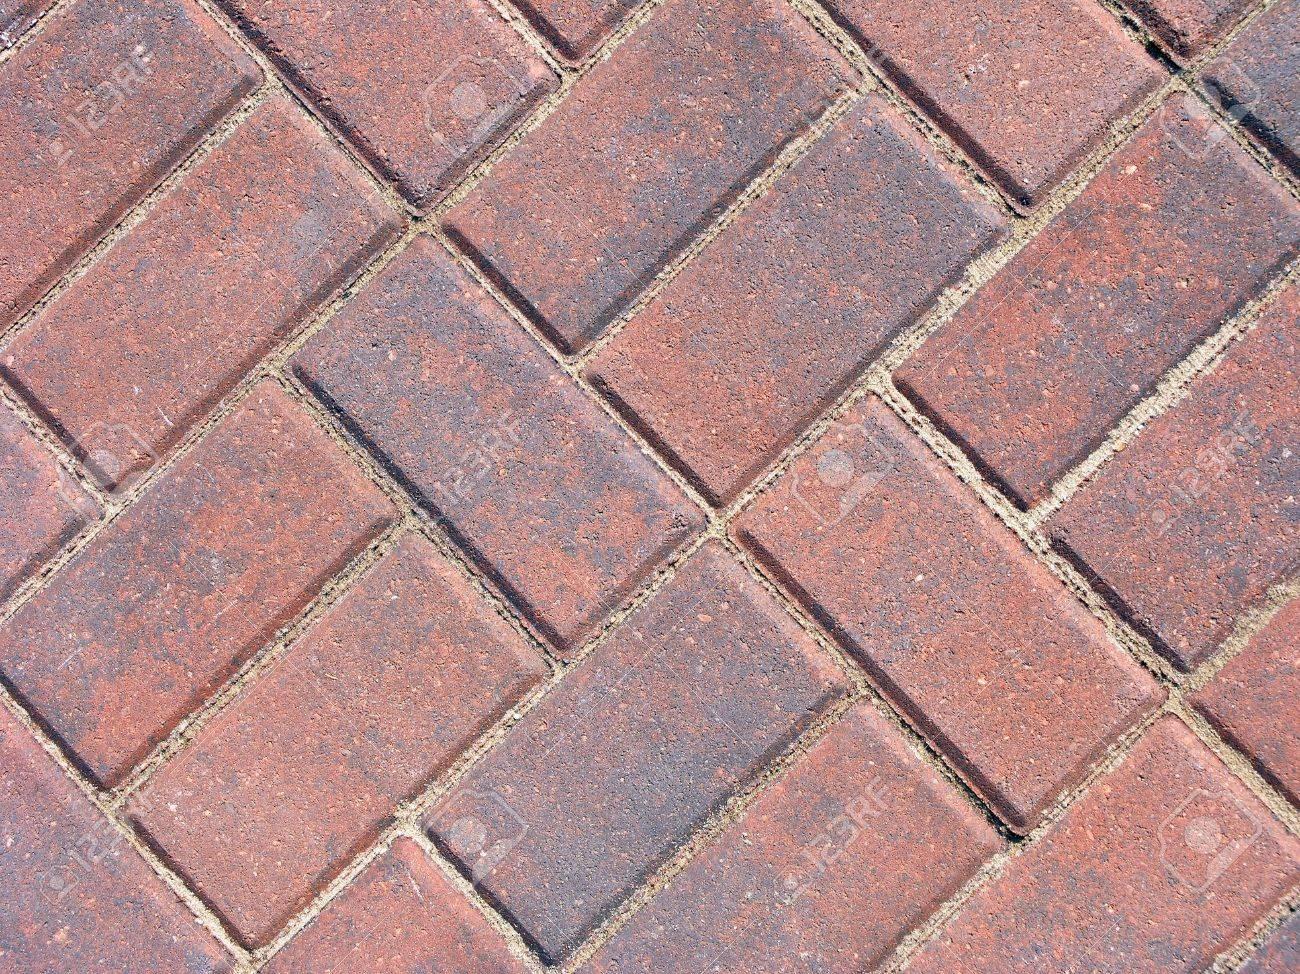 Brick Patio Block Design Stock Photo   236596